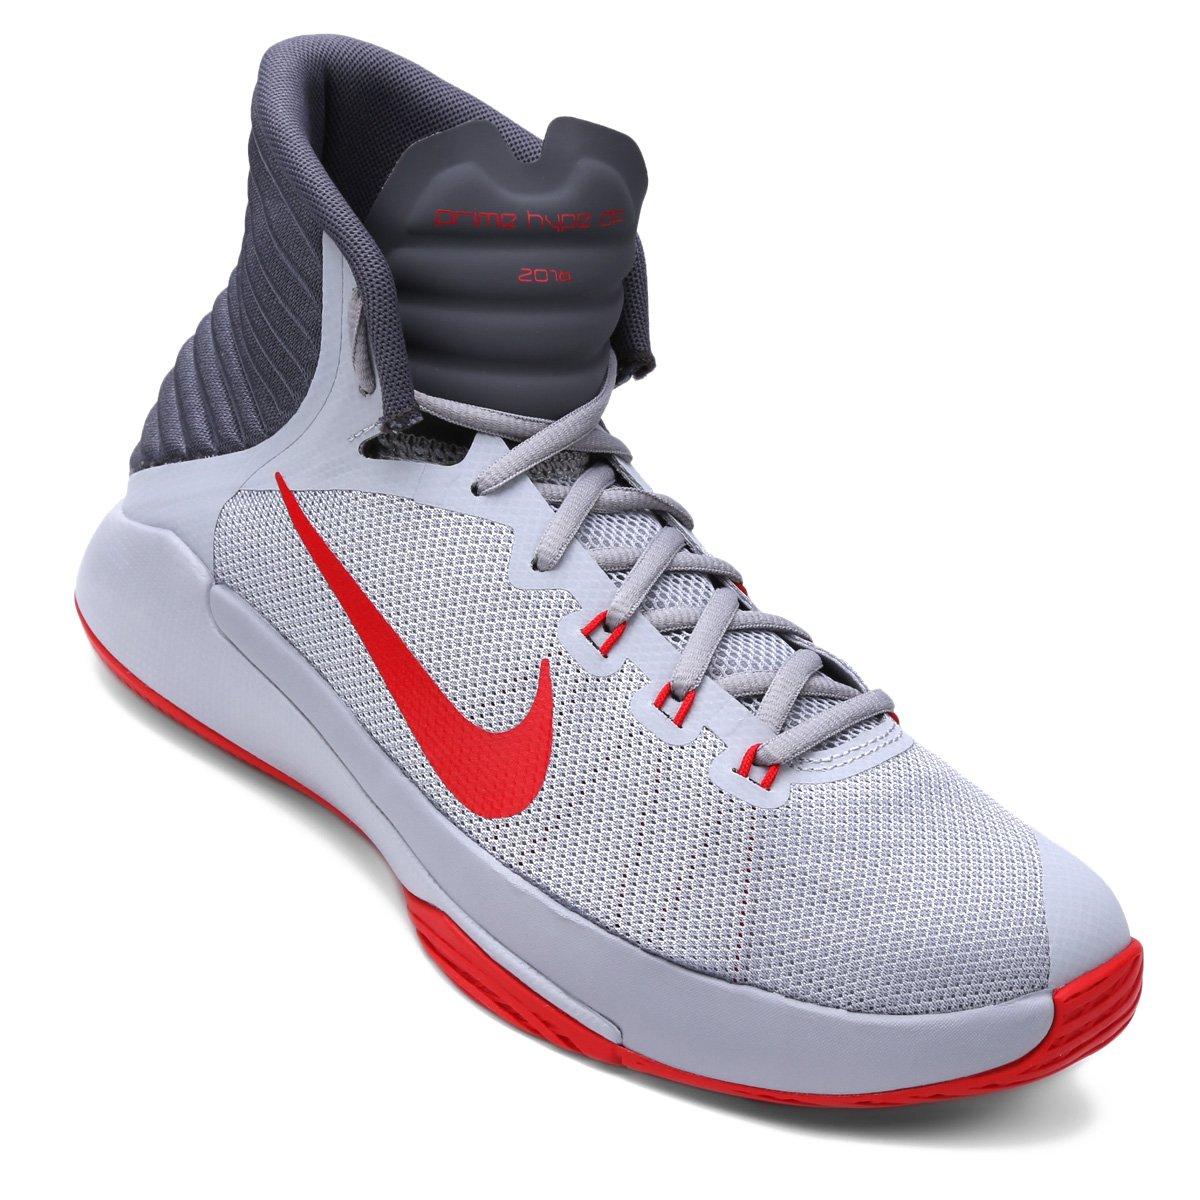 37ce0aac2a Tênis Nike Prime Hype DF - Compre Agora